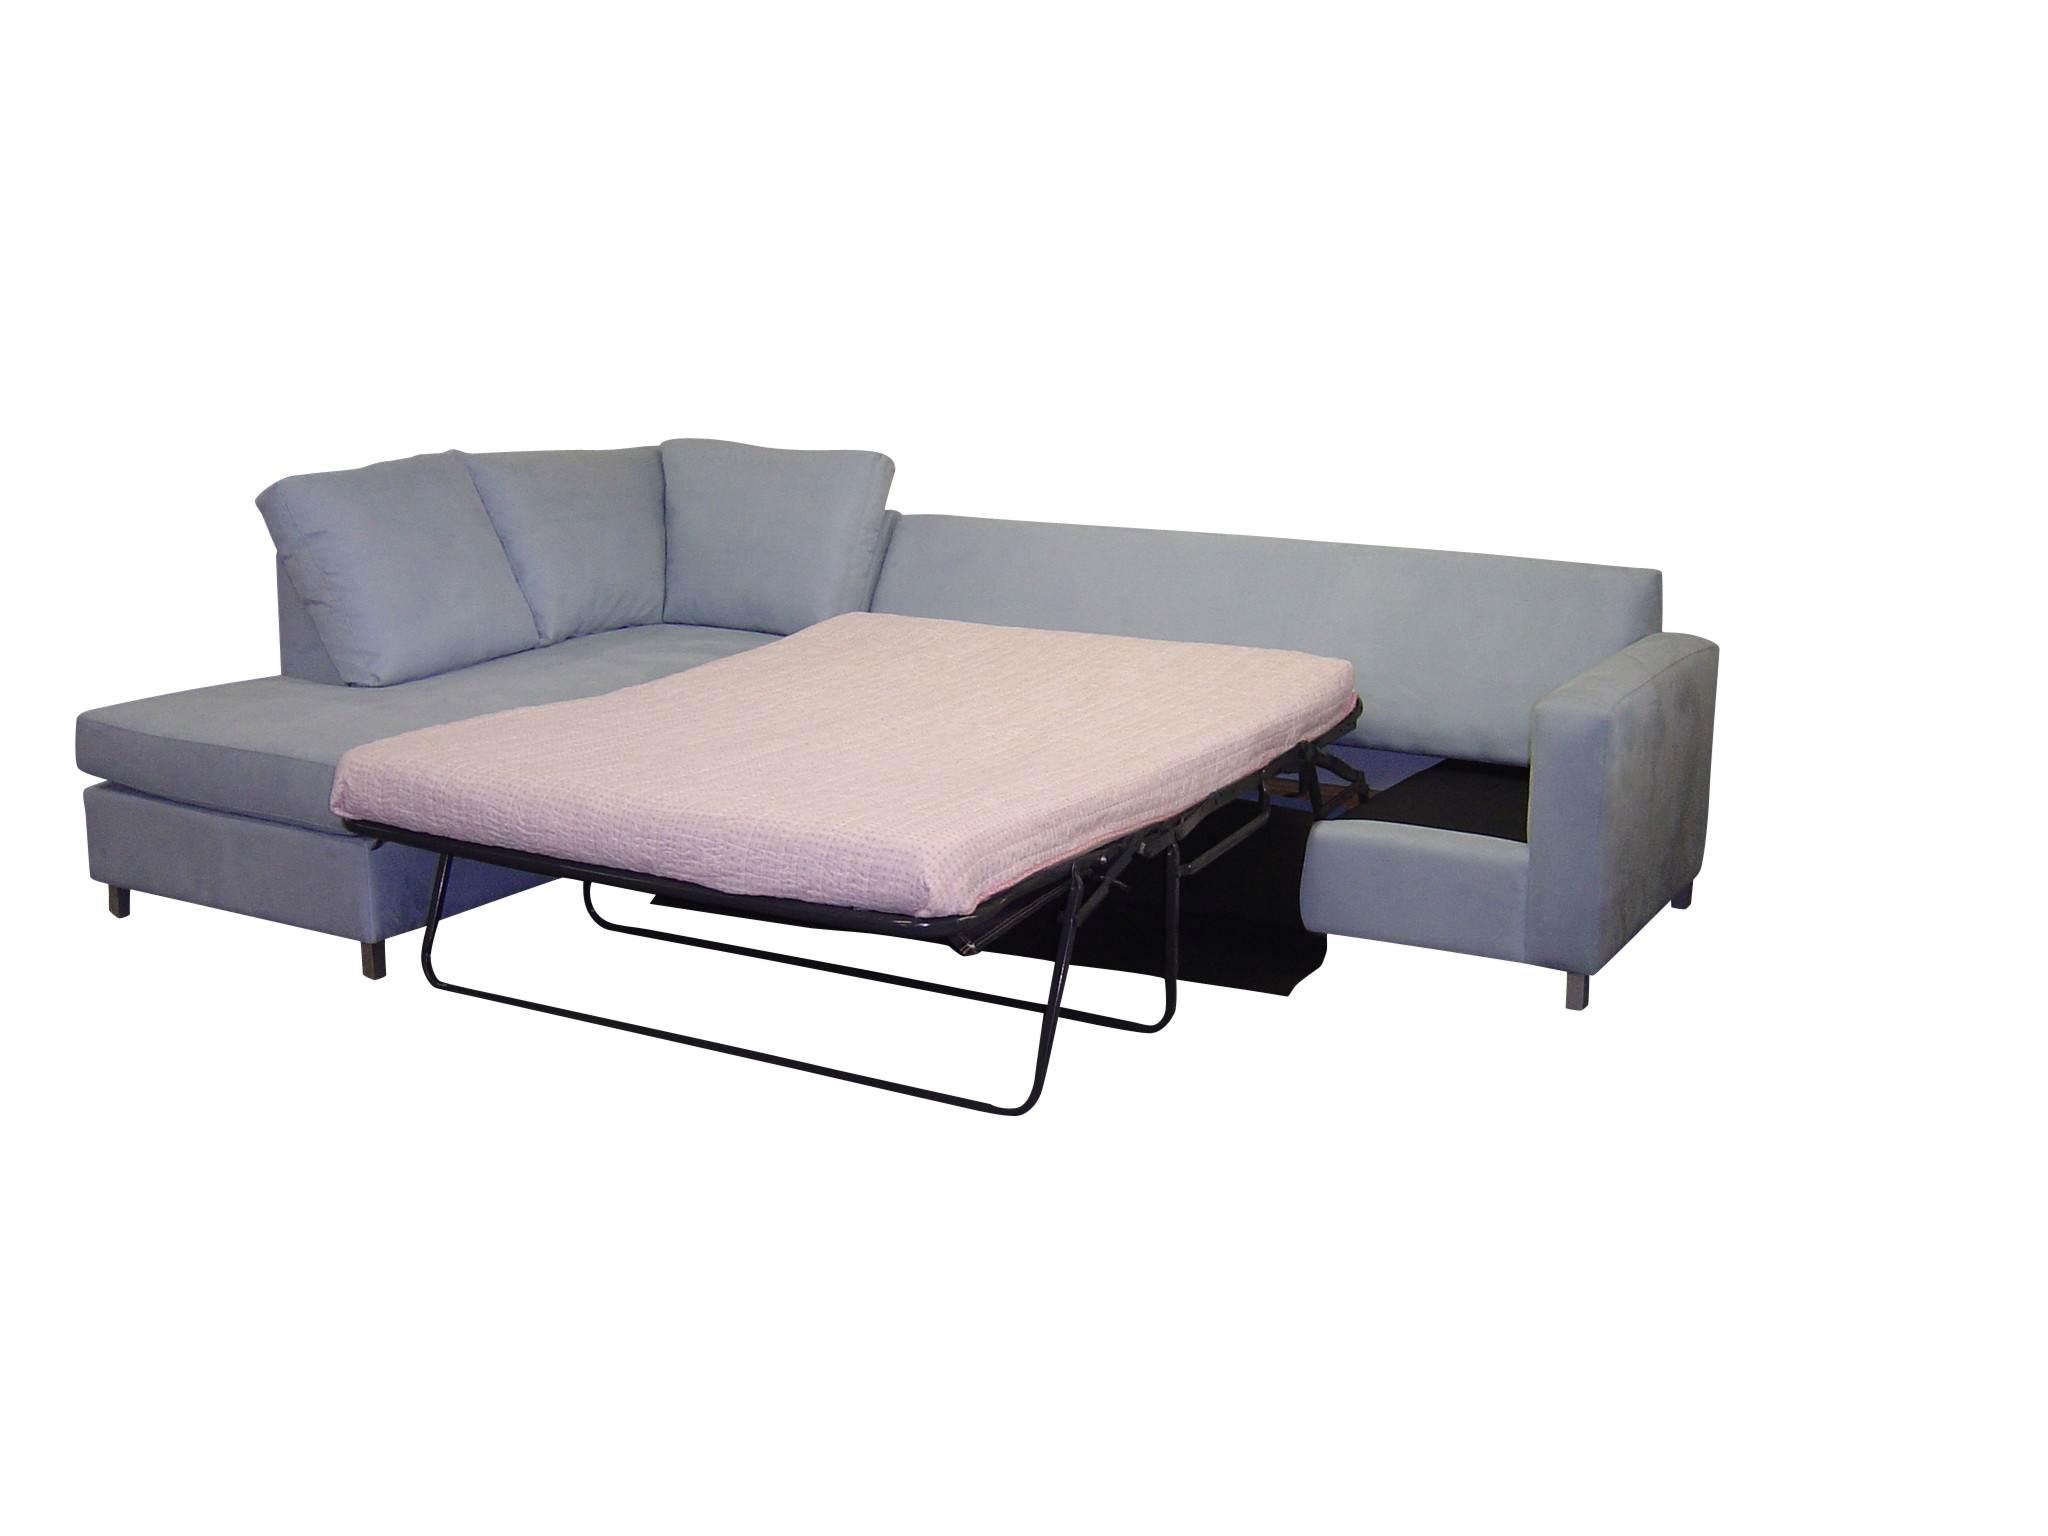 modular lounge with sofa bed adelaide small living room ideas black sofas australian made brokeasshome